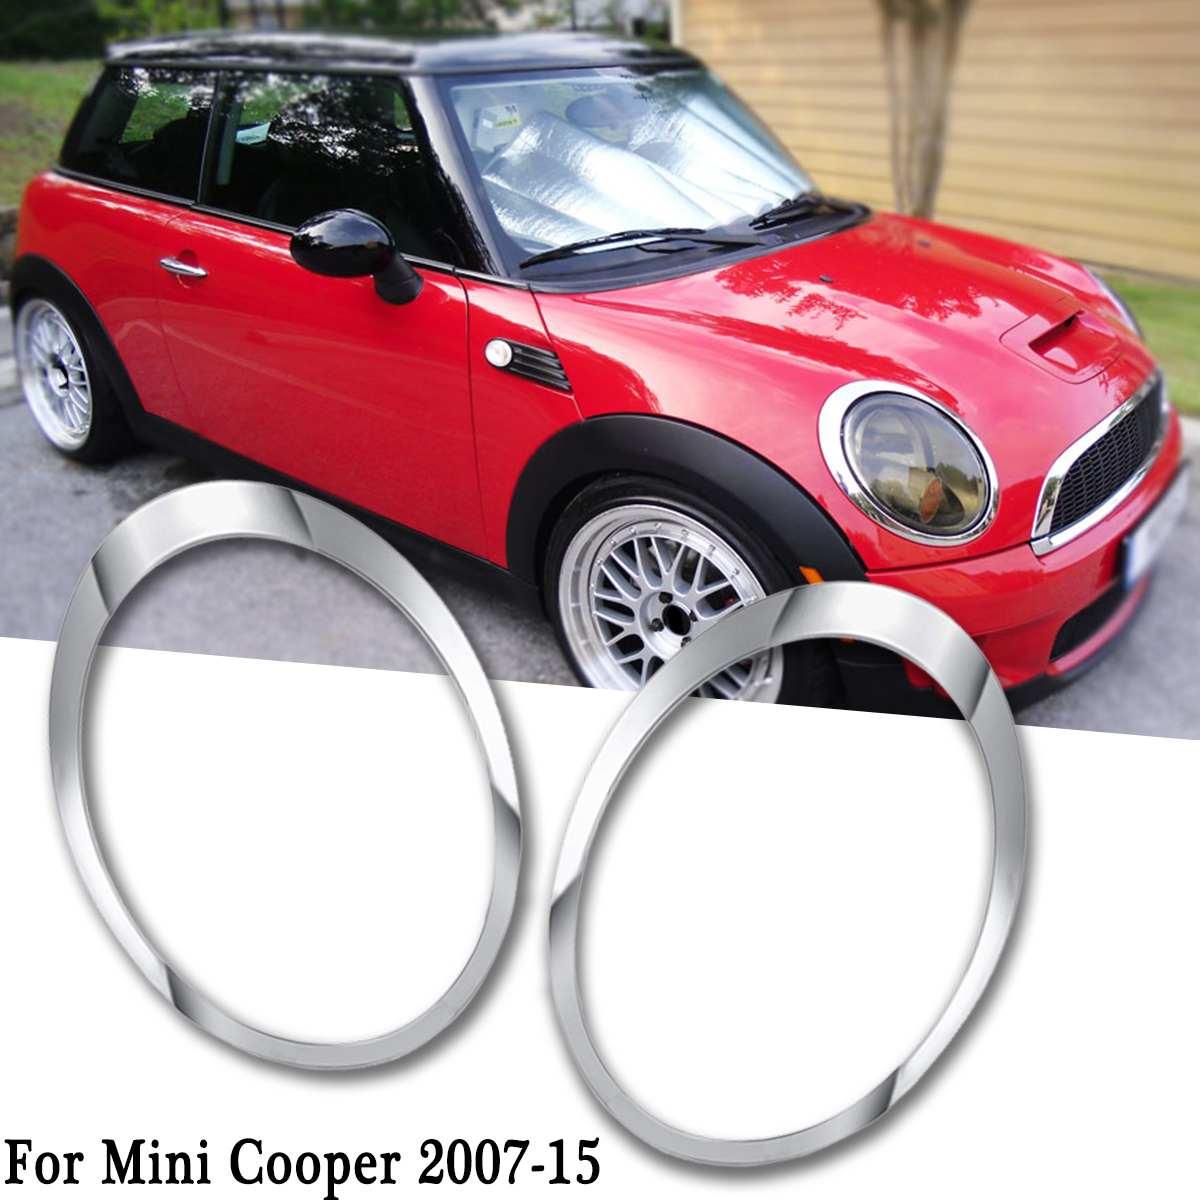 Mini Cooper R50 R53 2001-2006 Vetech Tie Rod Left Steering Replacement Part